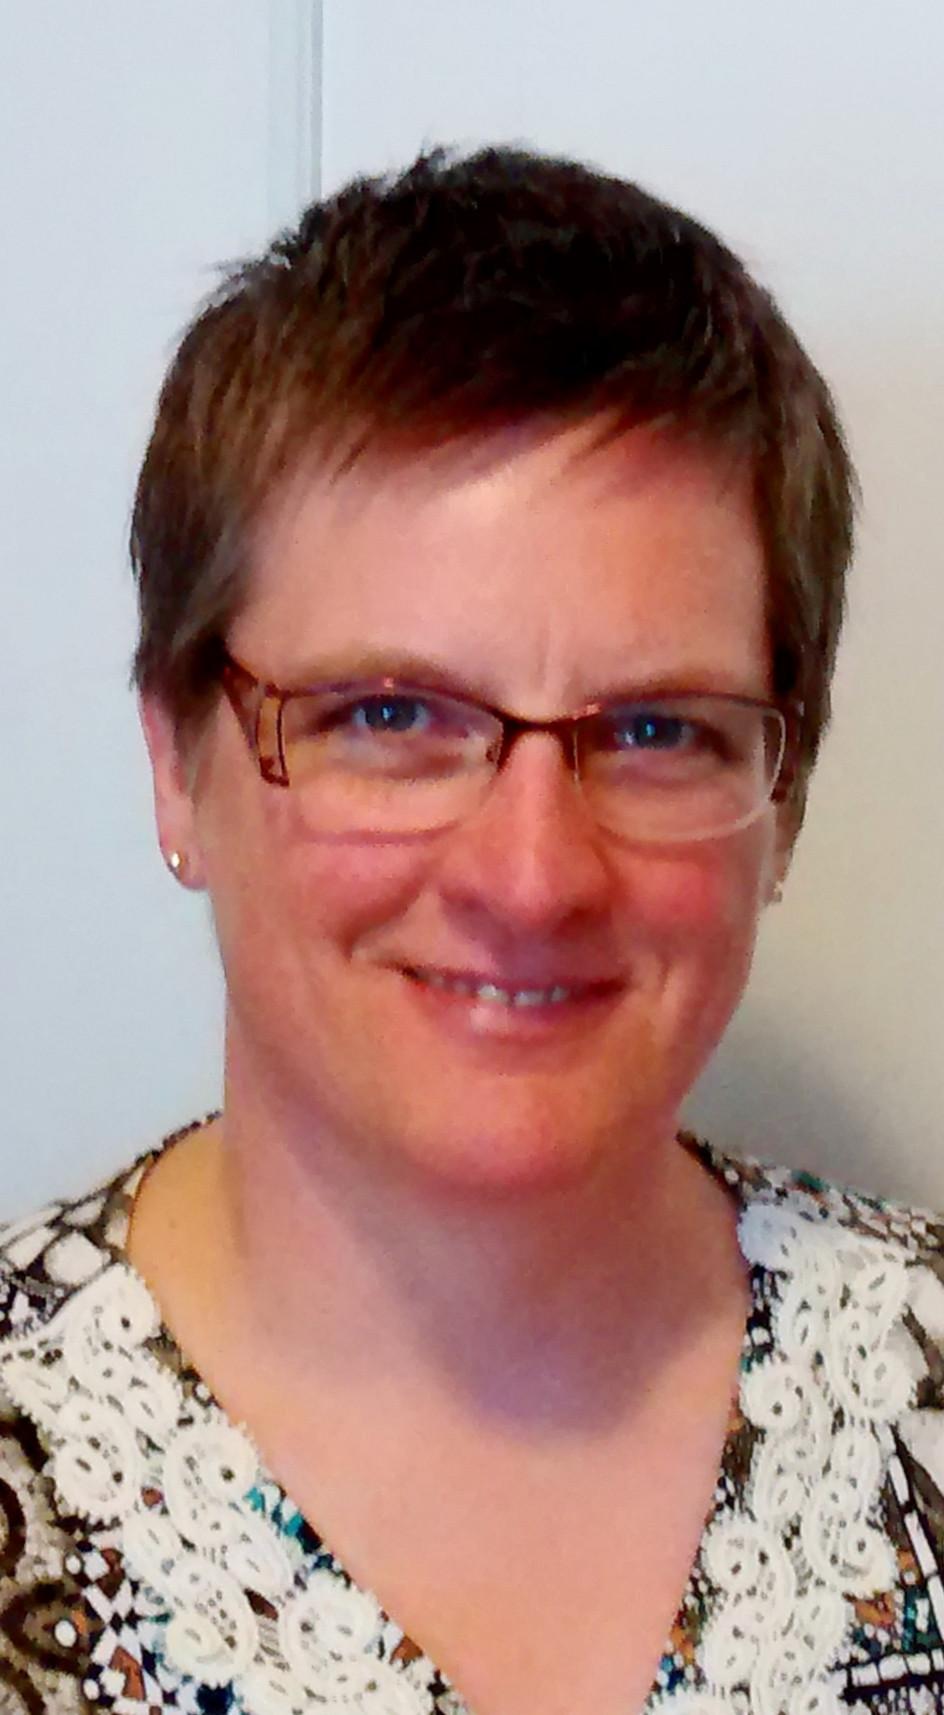 Minister Cheryl-Lynn MacPherson